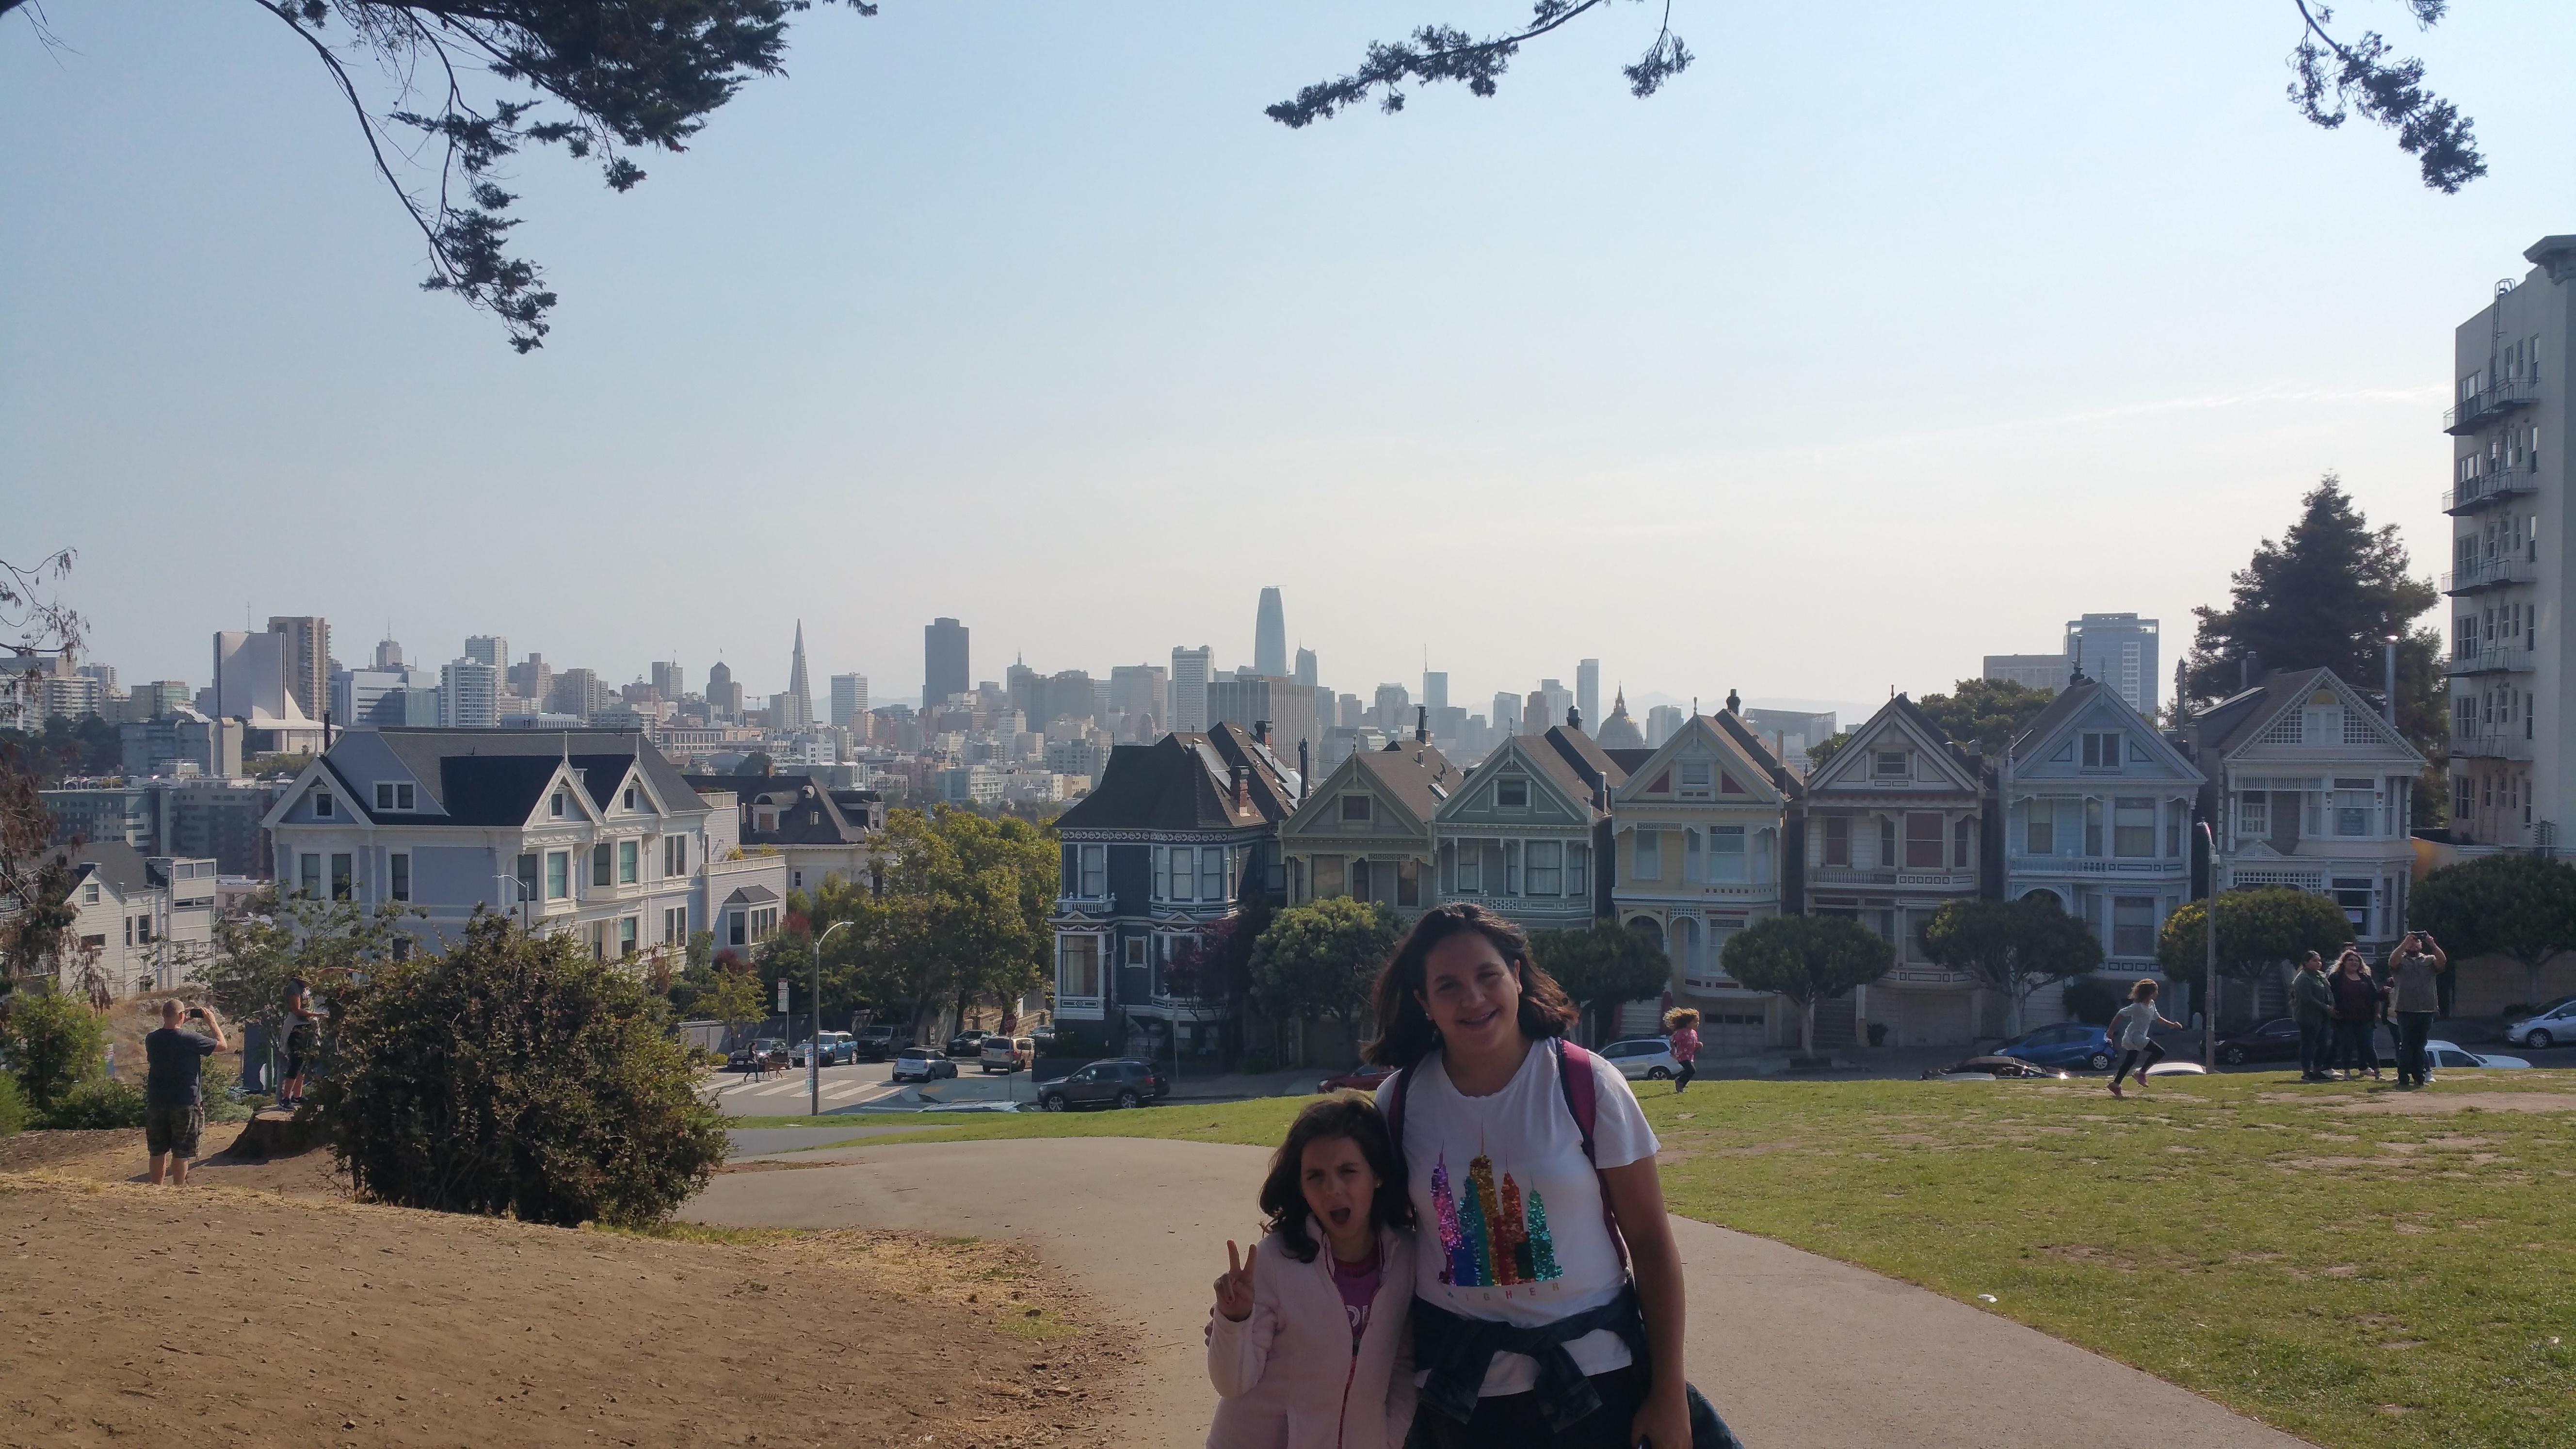 PAINTED LADIES SAN FRANCISCO CALIFORNIA USA